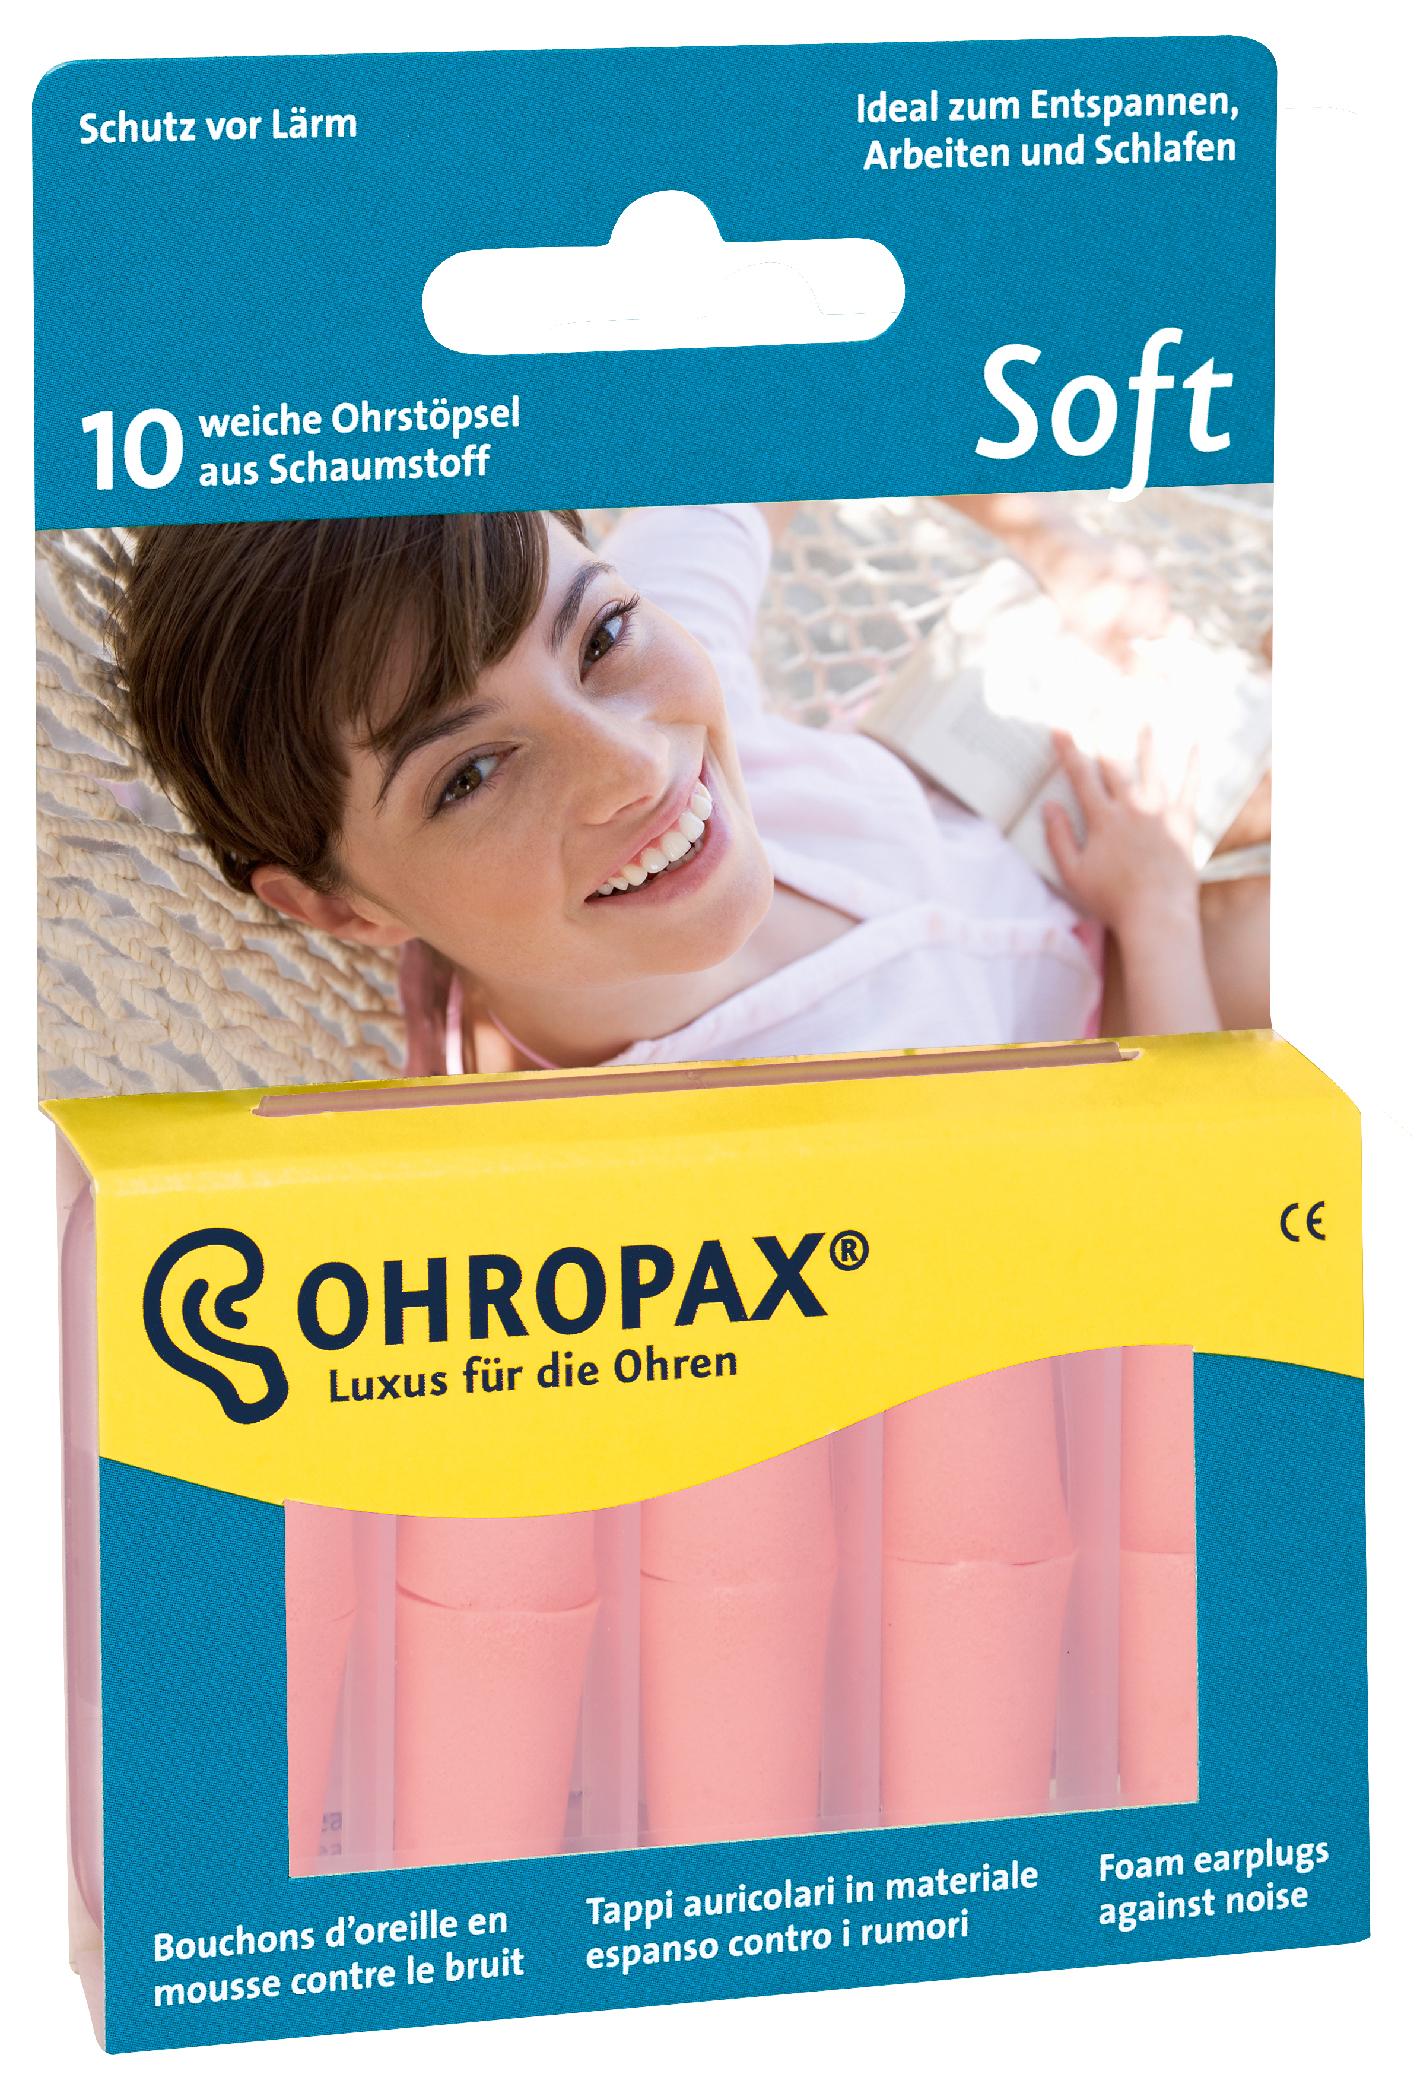 OHROPAX Soft